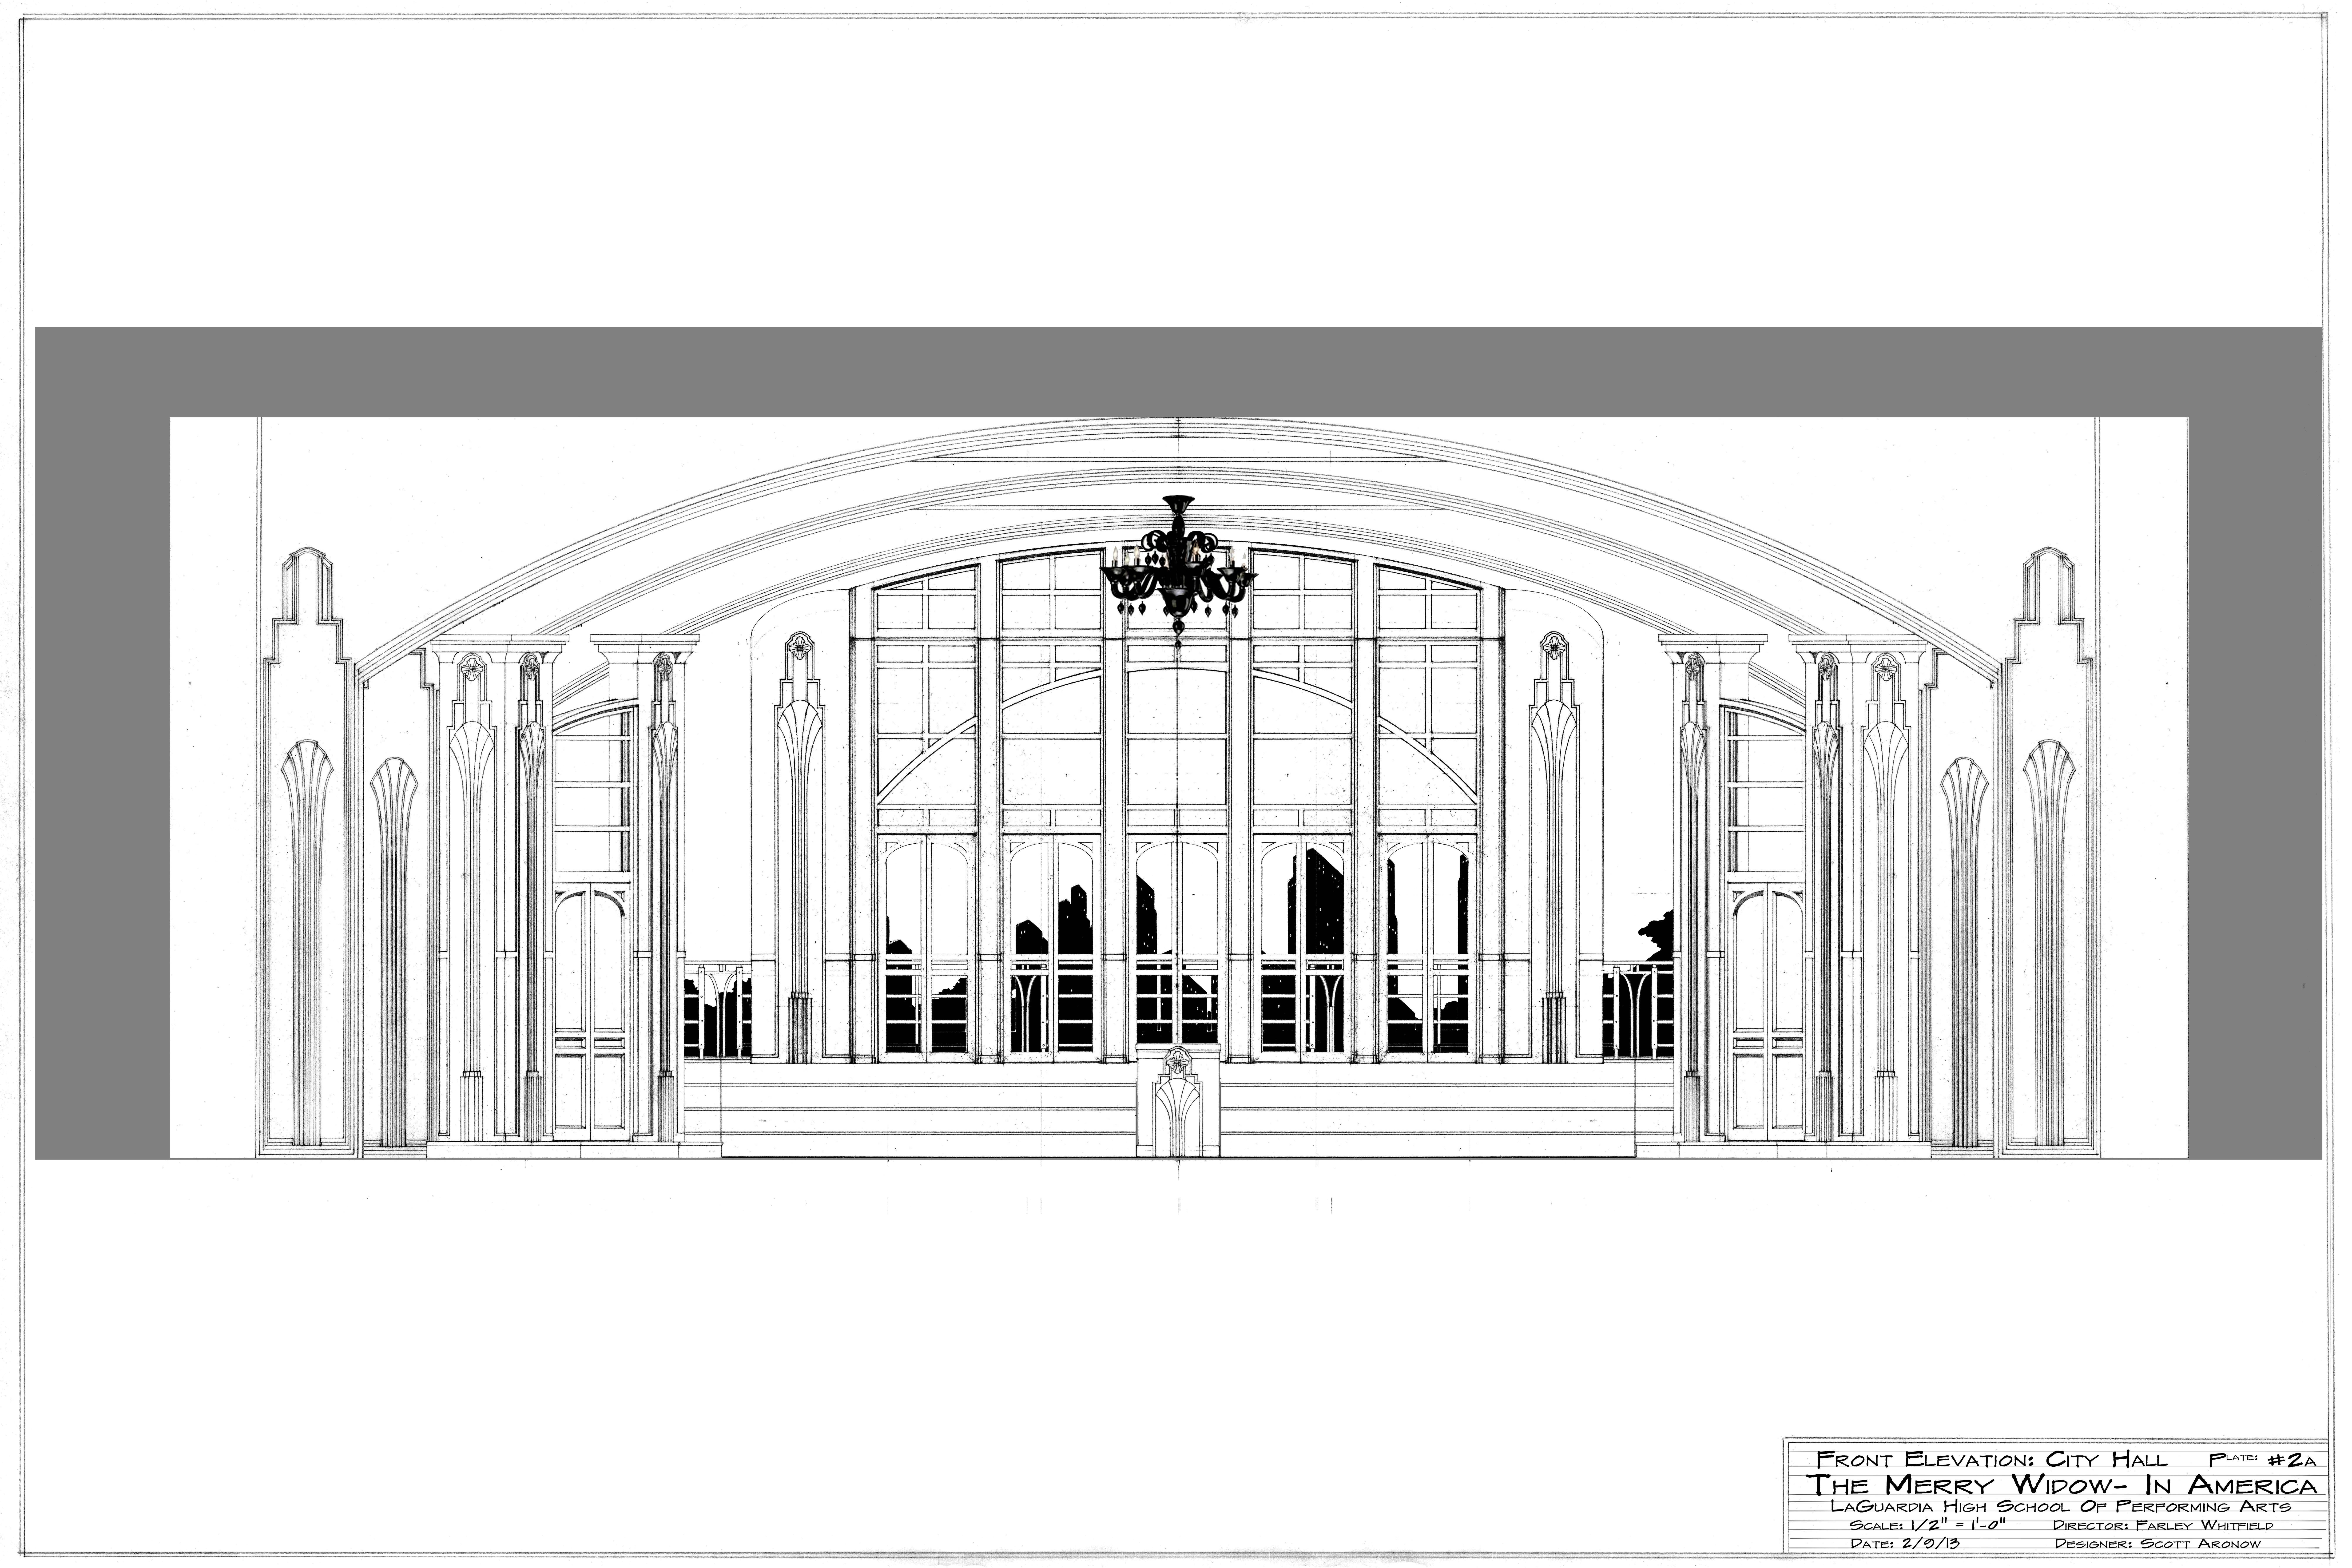 Plate #2a. Elevation-City Hall